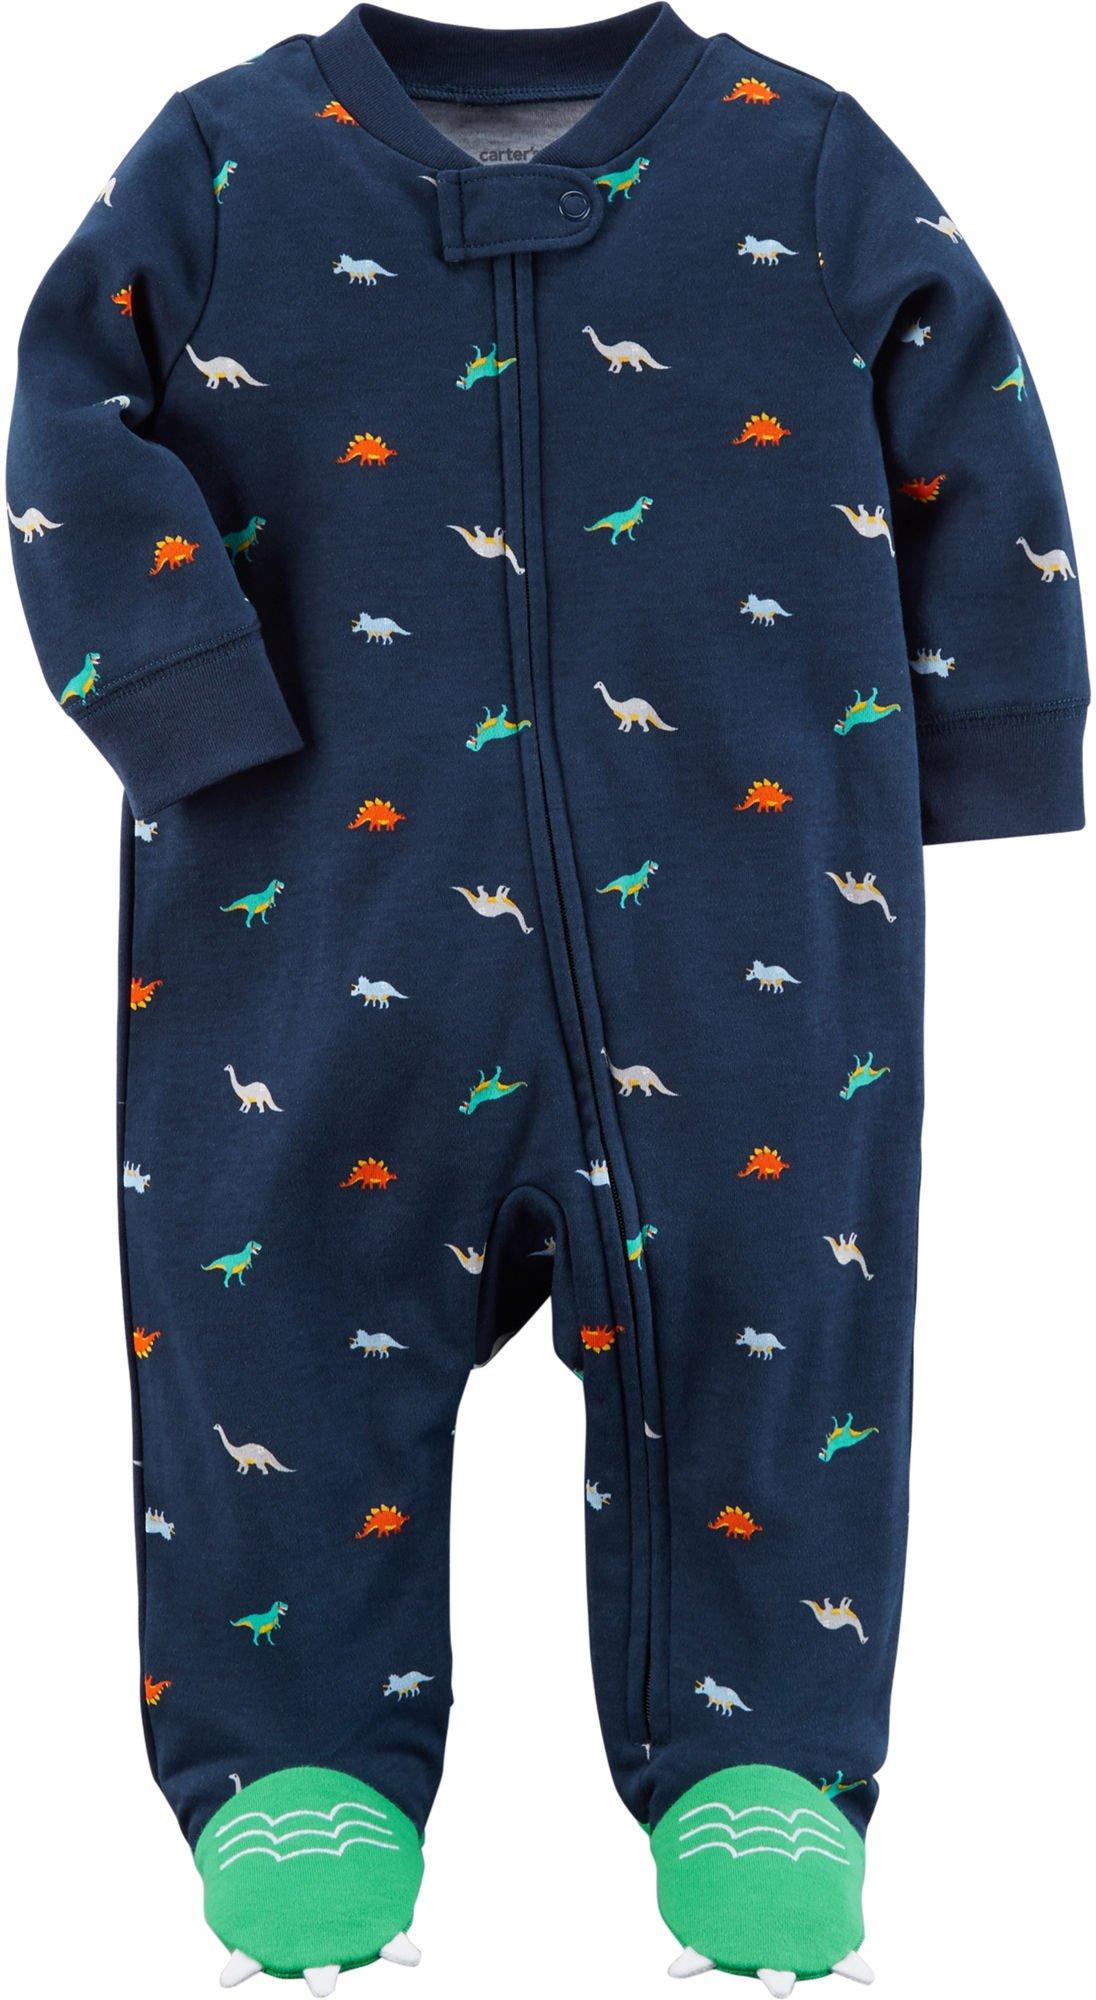 Carter's Baby Boys' Zip up Dinosaur Sleep and Play 9 Months